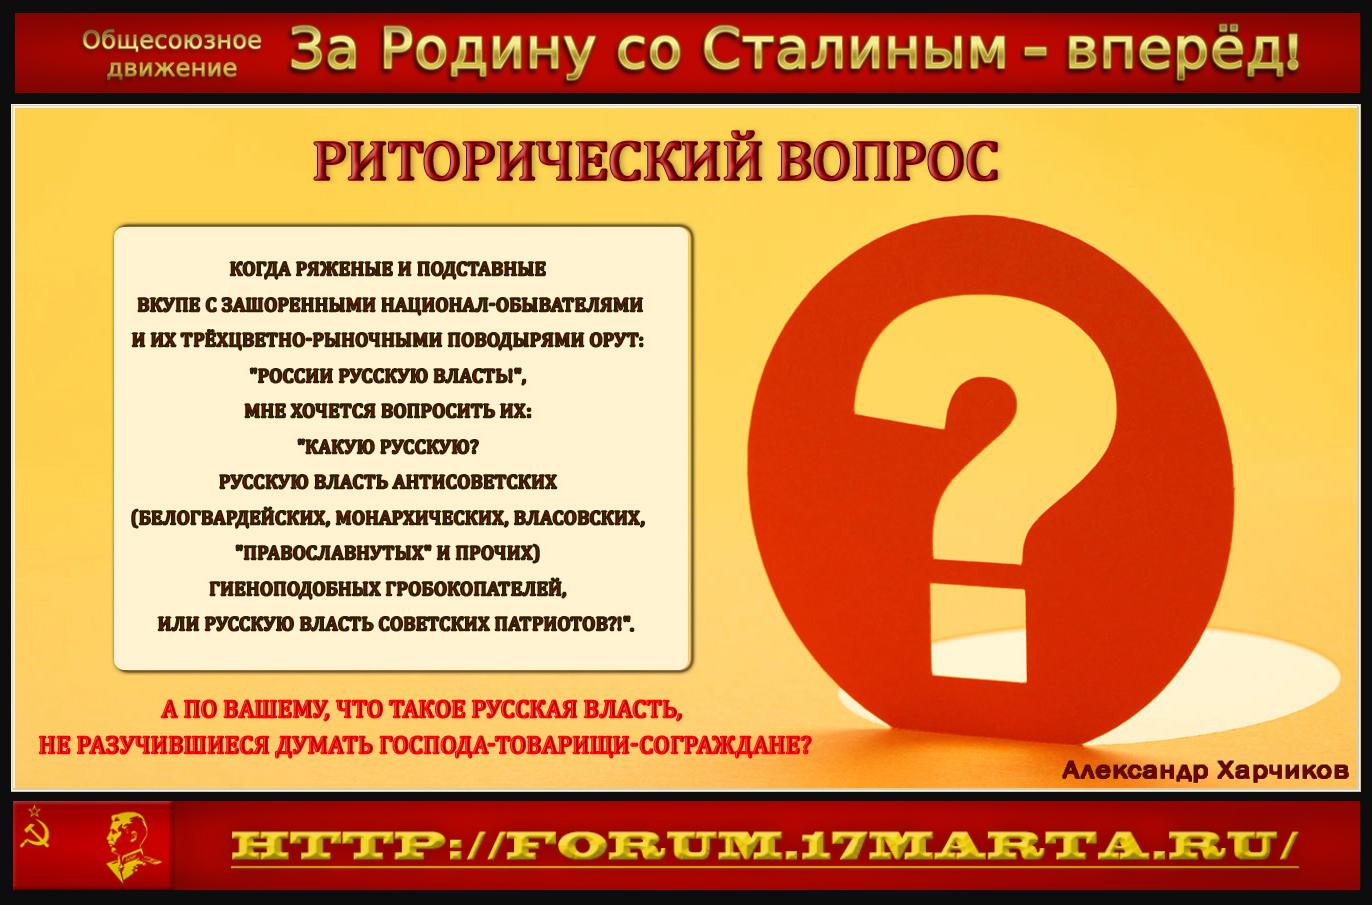 https://images.vfl.ru/ii/1531664762/992b94e5/22494616.jpg